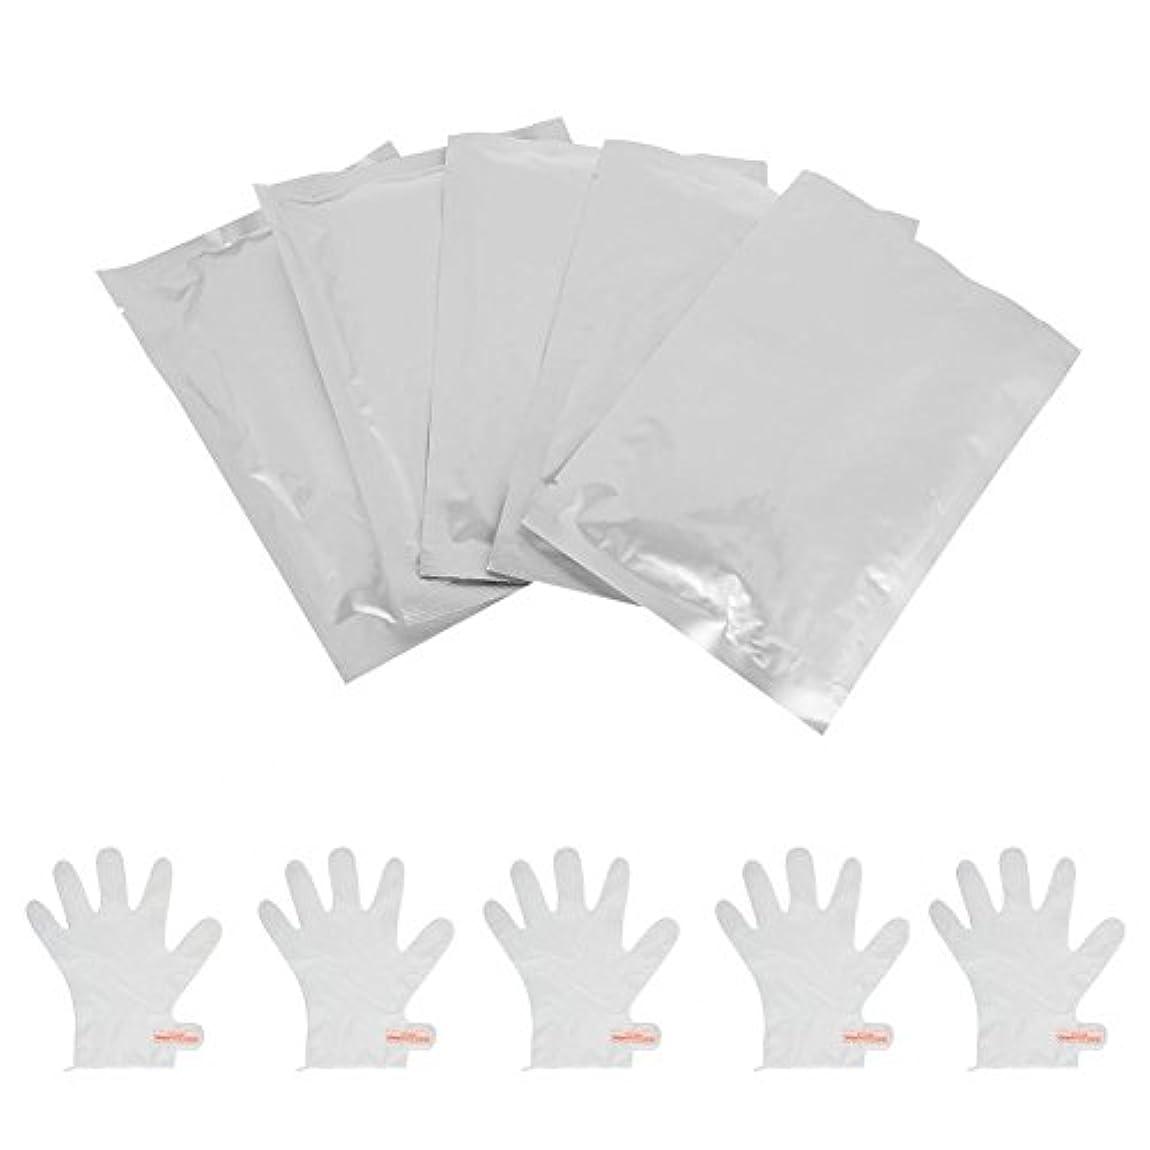 Ochun ハンドマスク ハンドパック しっとり 保湿ケア 手荒れを防ぐ 乾燥の季節に適用 手袋のようにはめるだけ 10枚セット